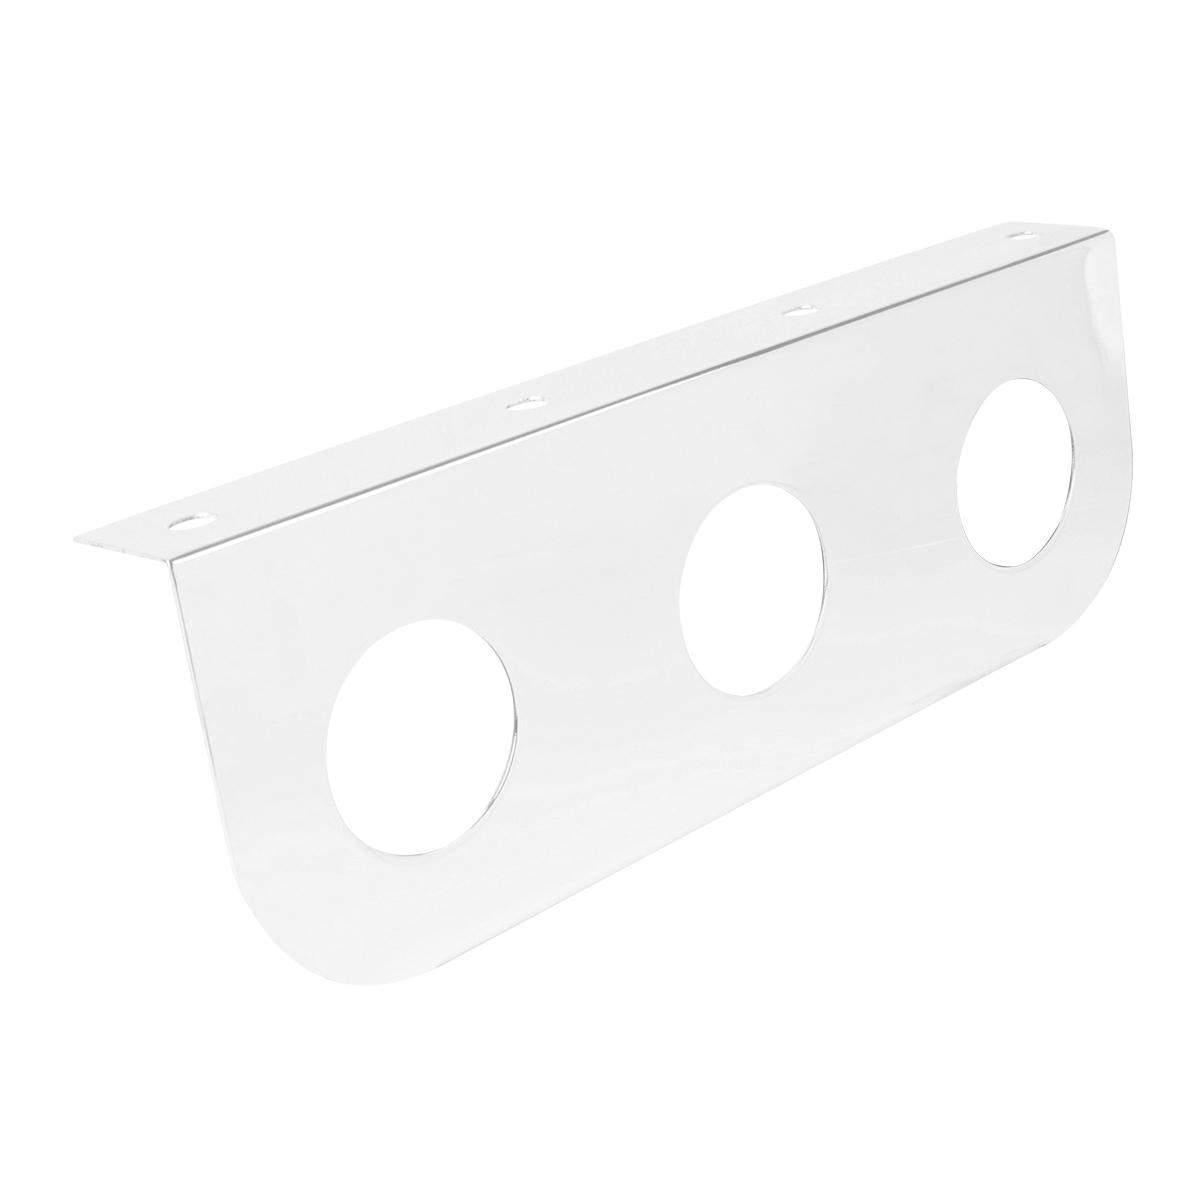 #86579 Chrome Plated Steel Light Bracket Only